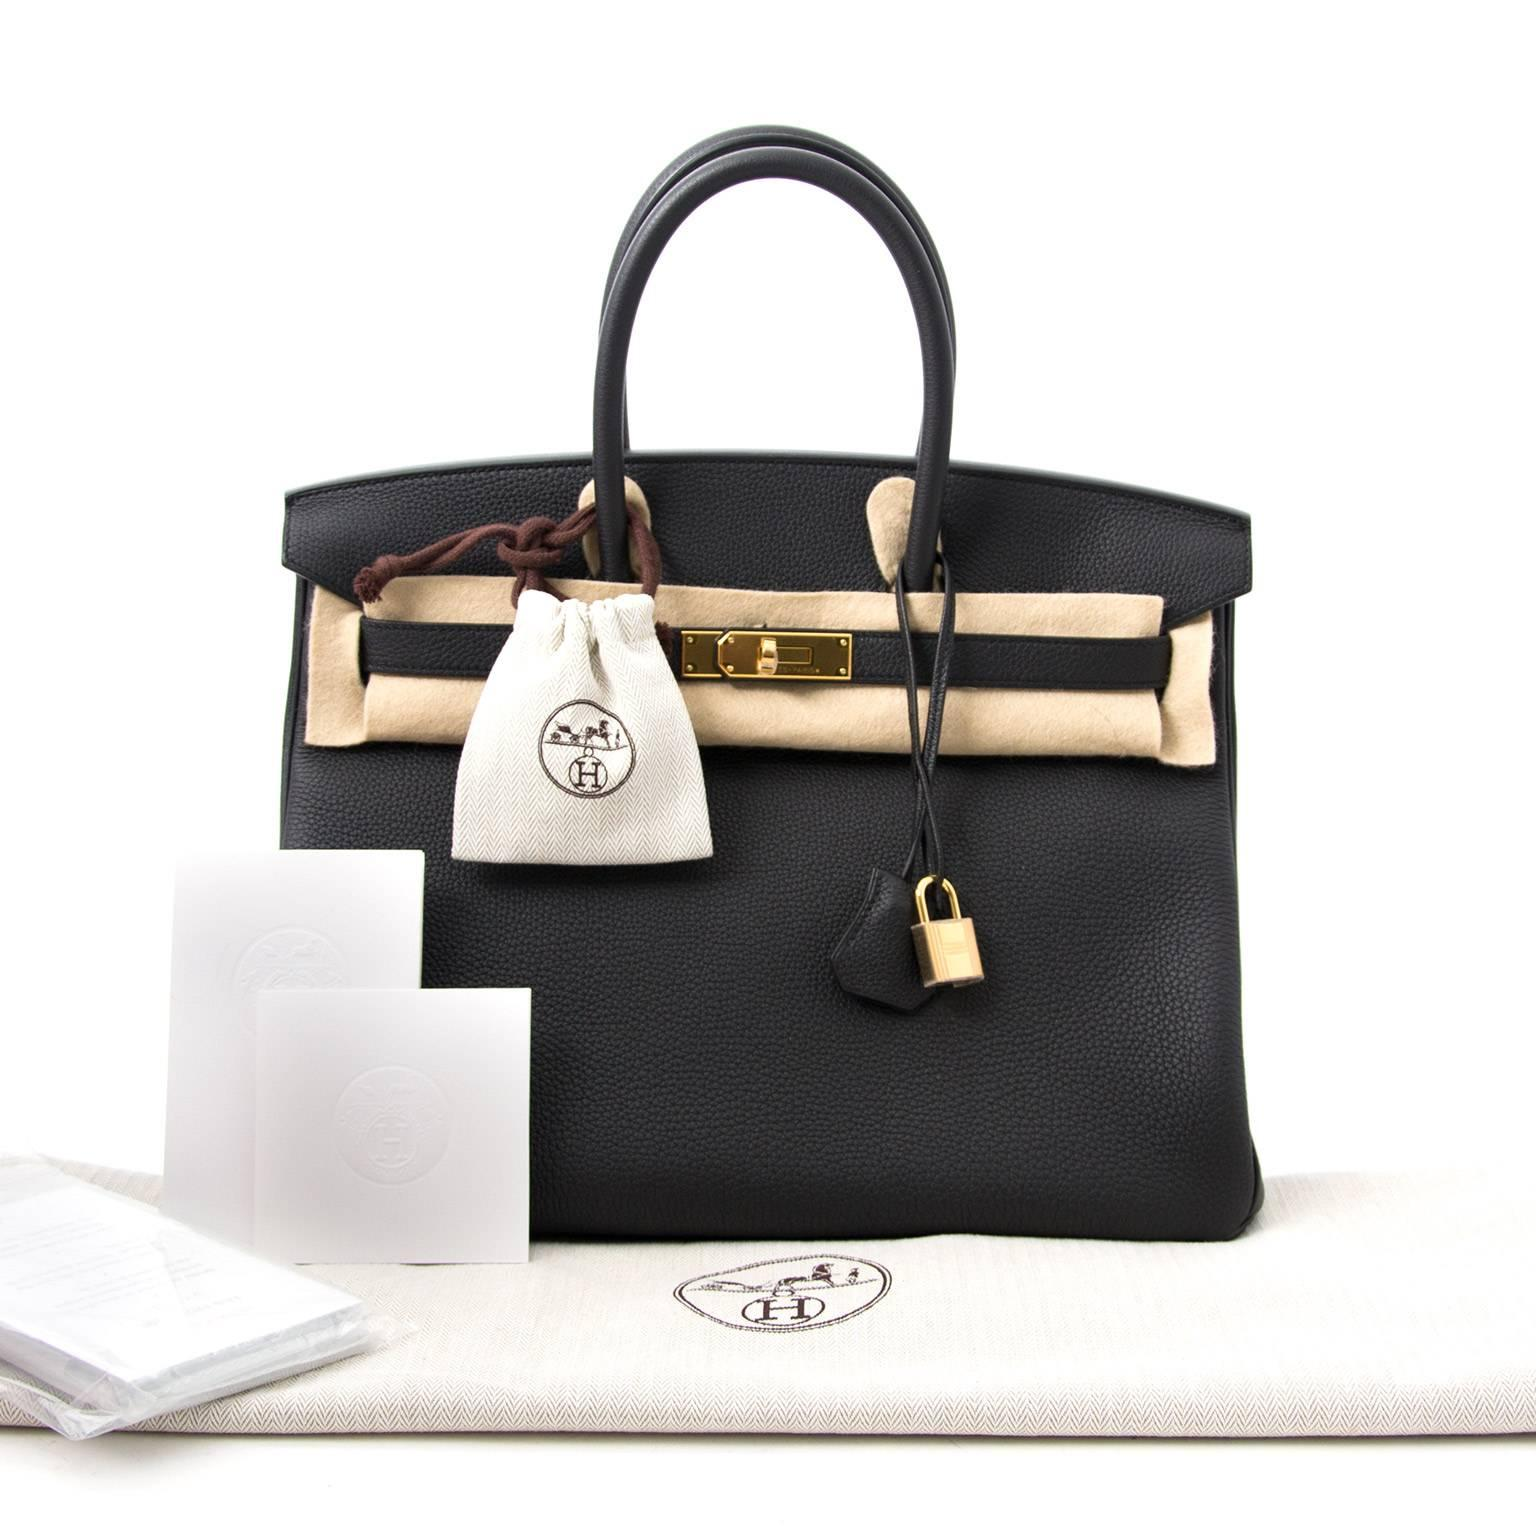 973a6a4edcdb Brand New Hermes Birkin Black Togo 35 GHW at 1stdibs